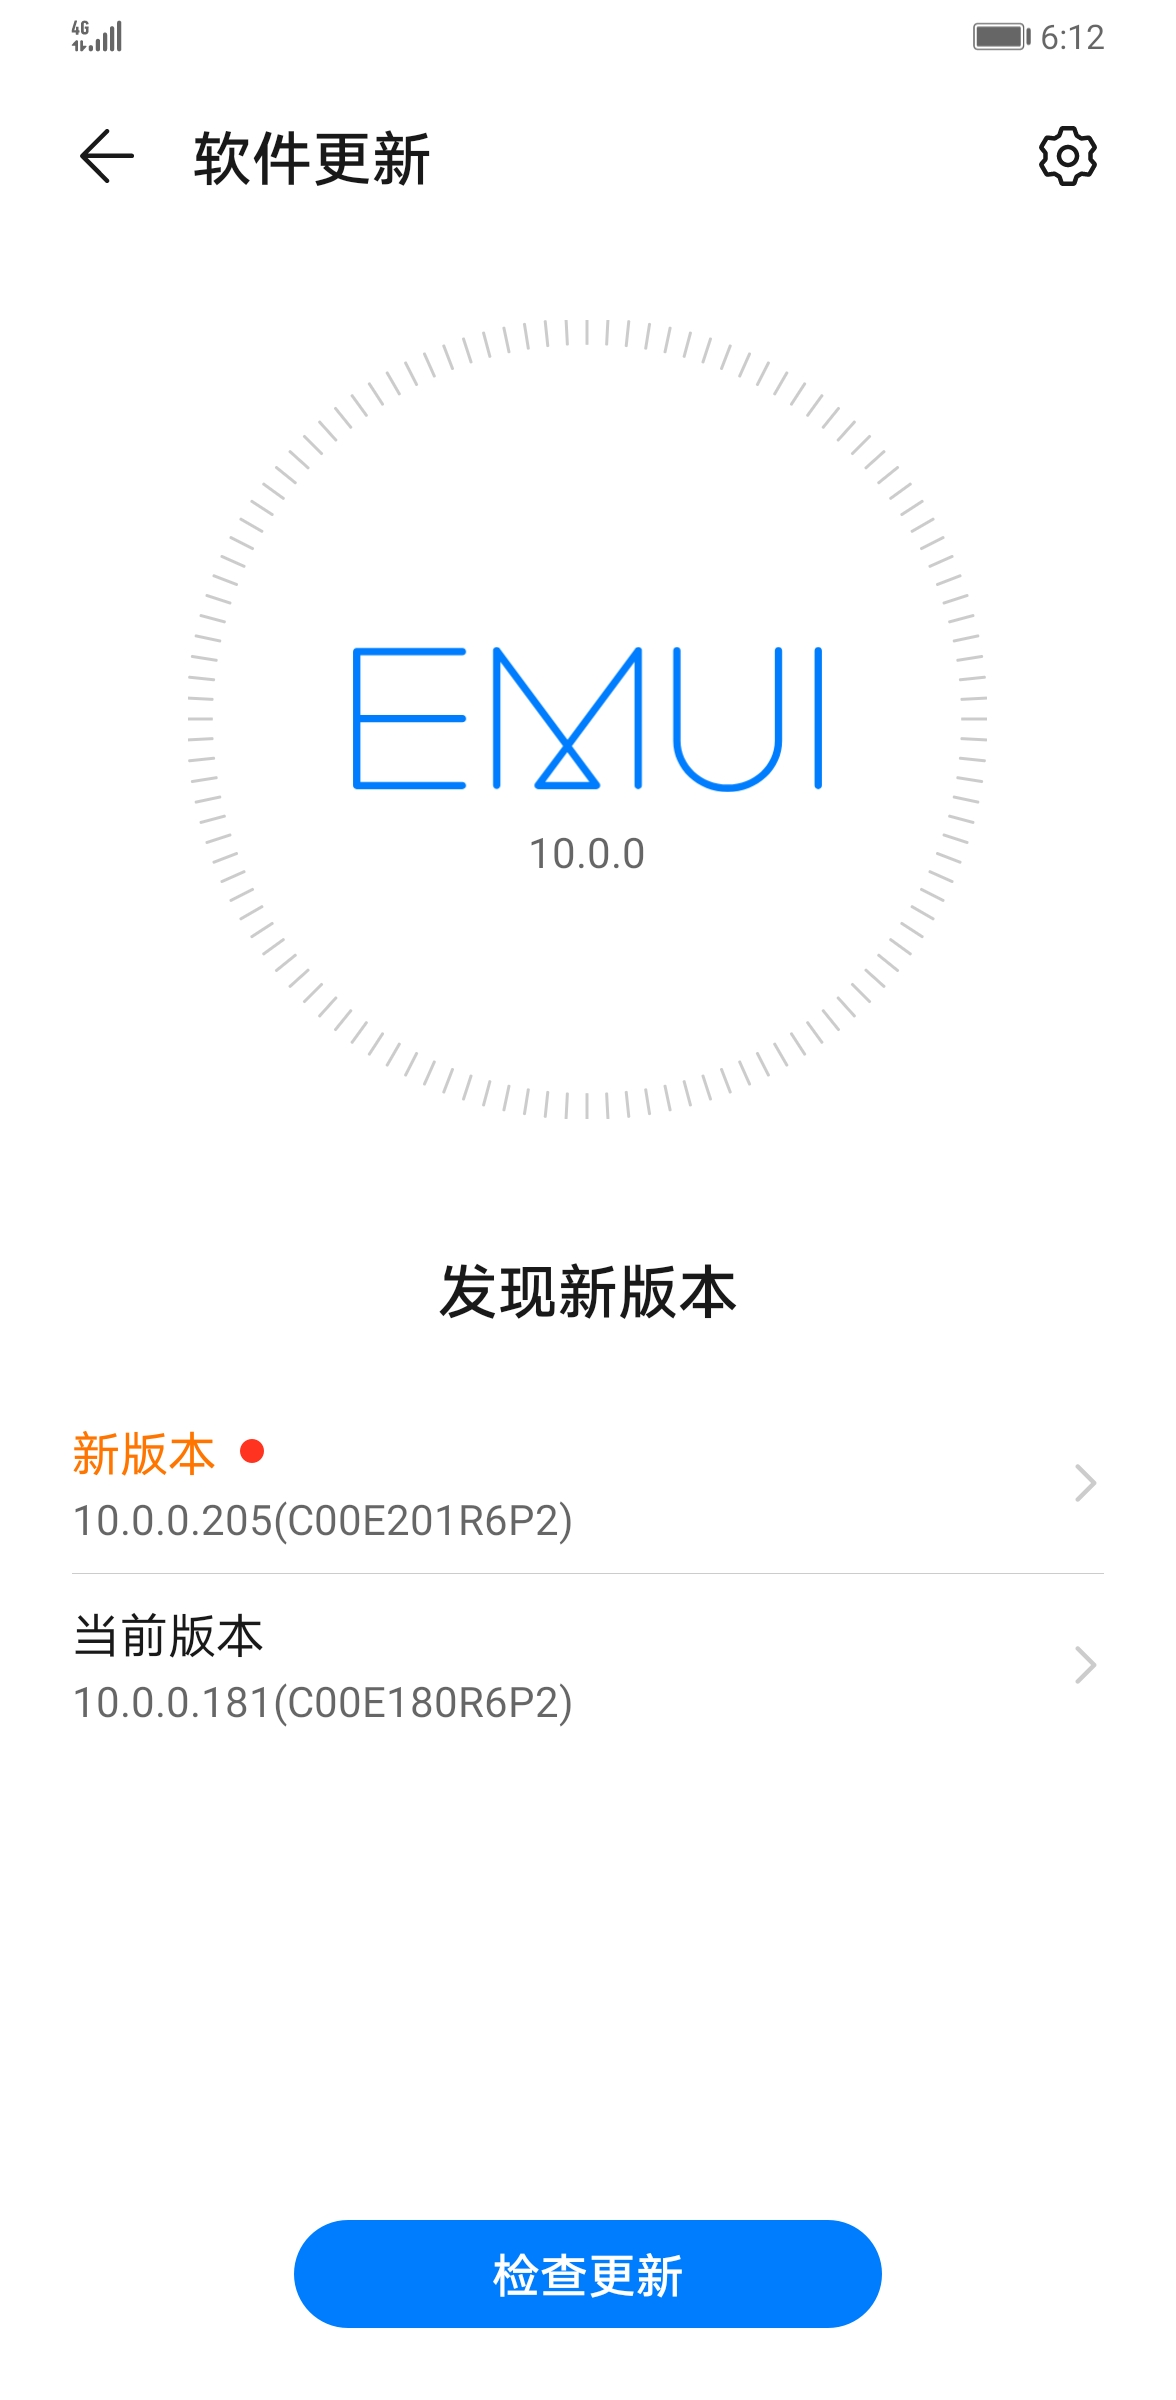 Screenshot_20200520_061207_com.huawei.android.hwouc.jpg